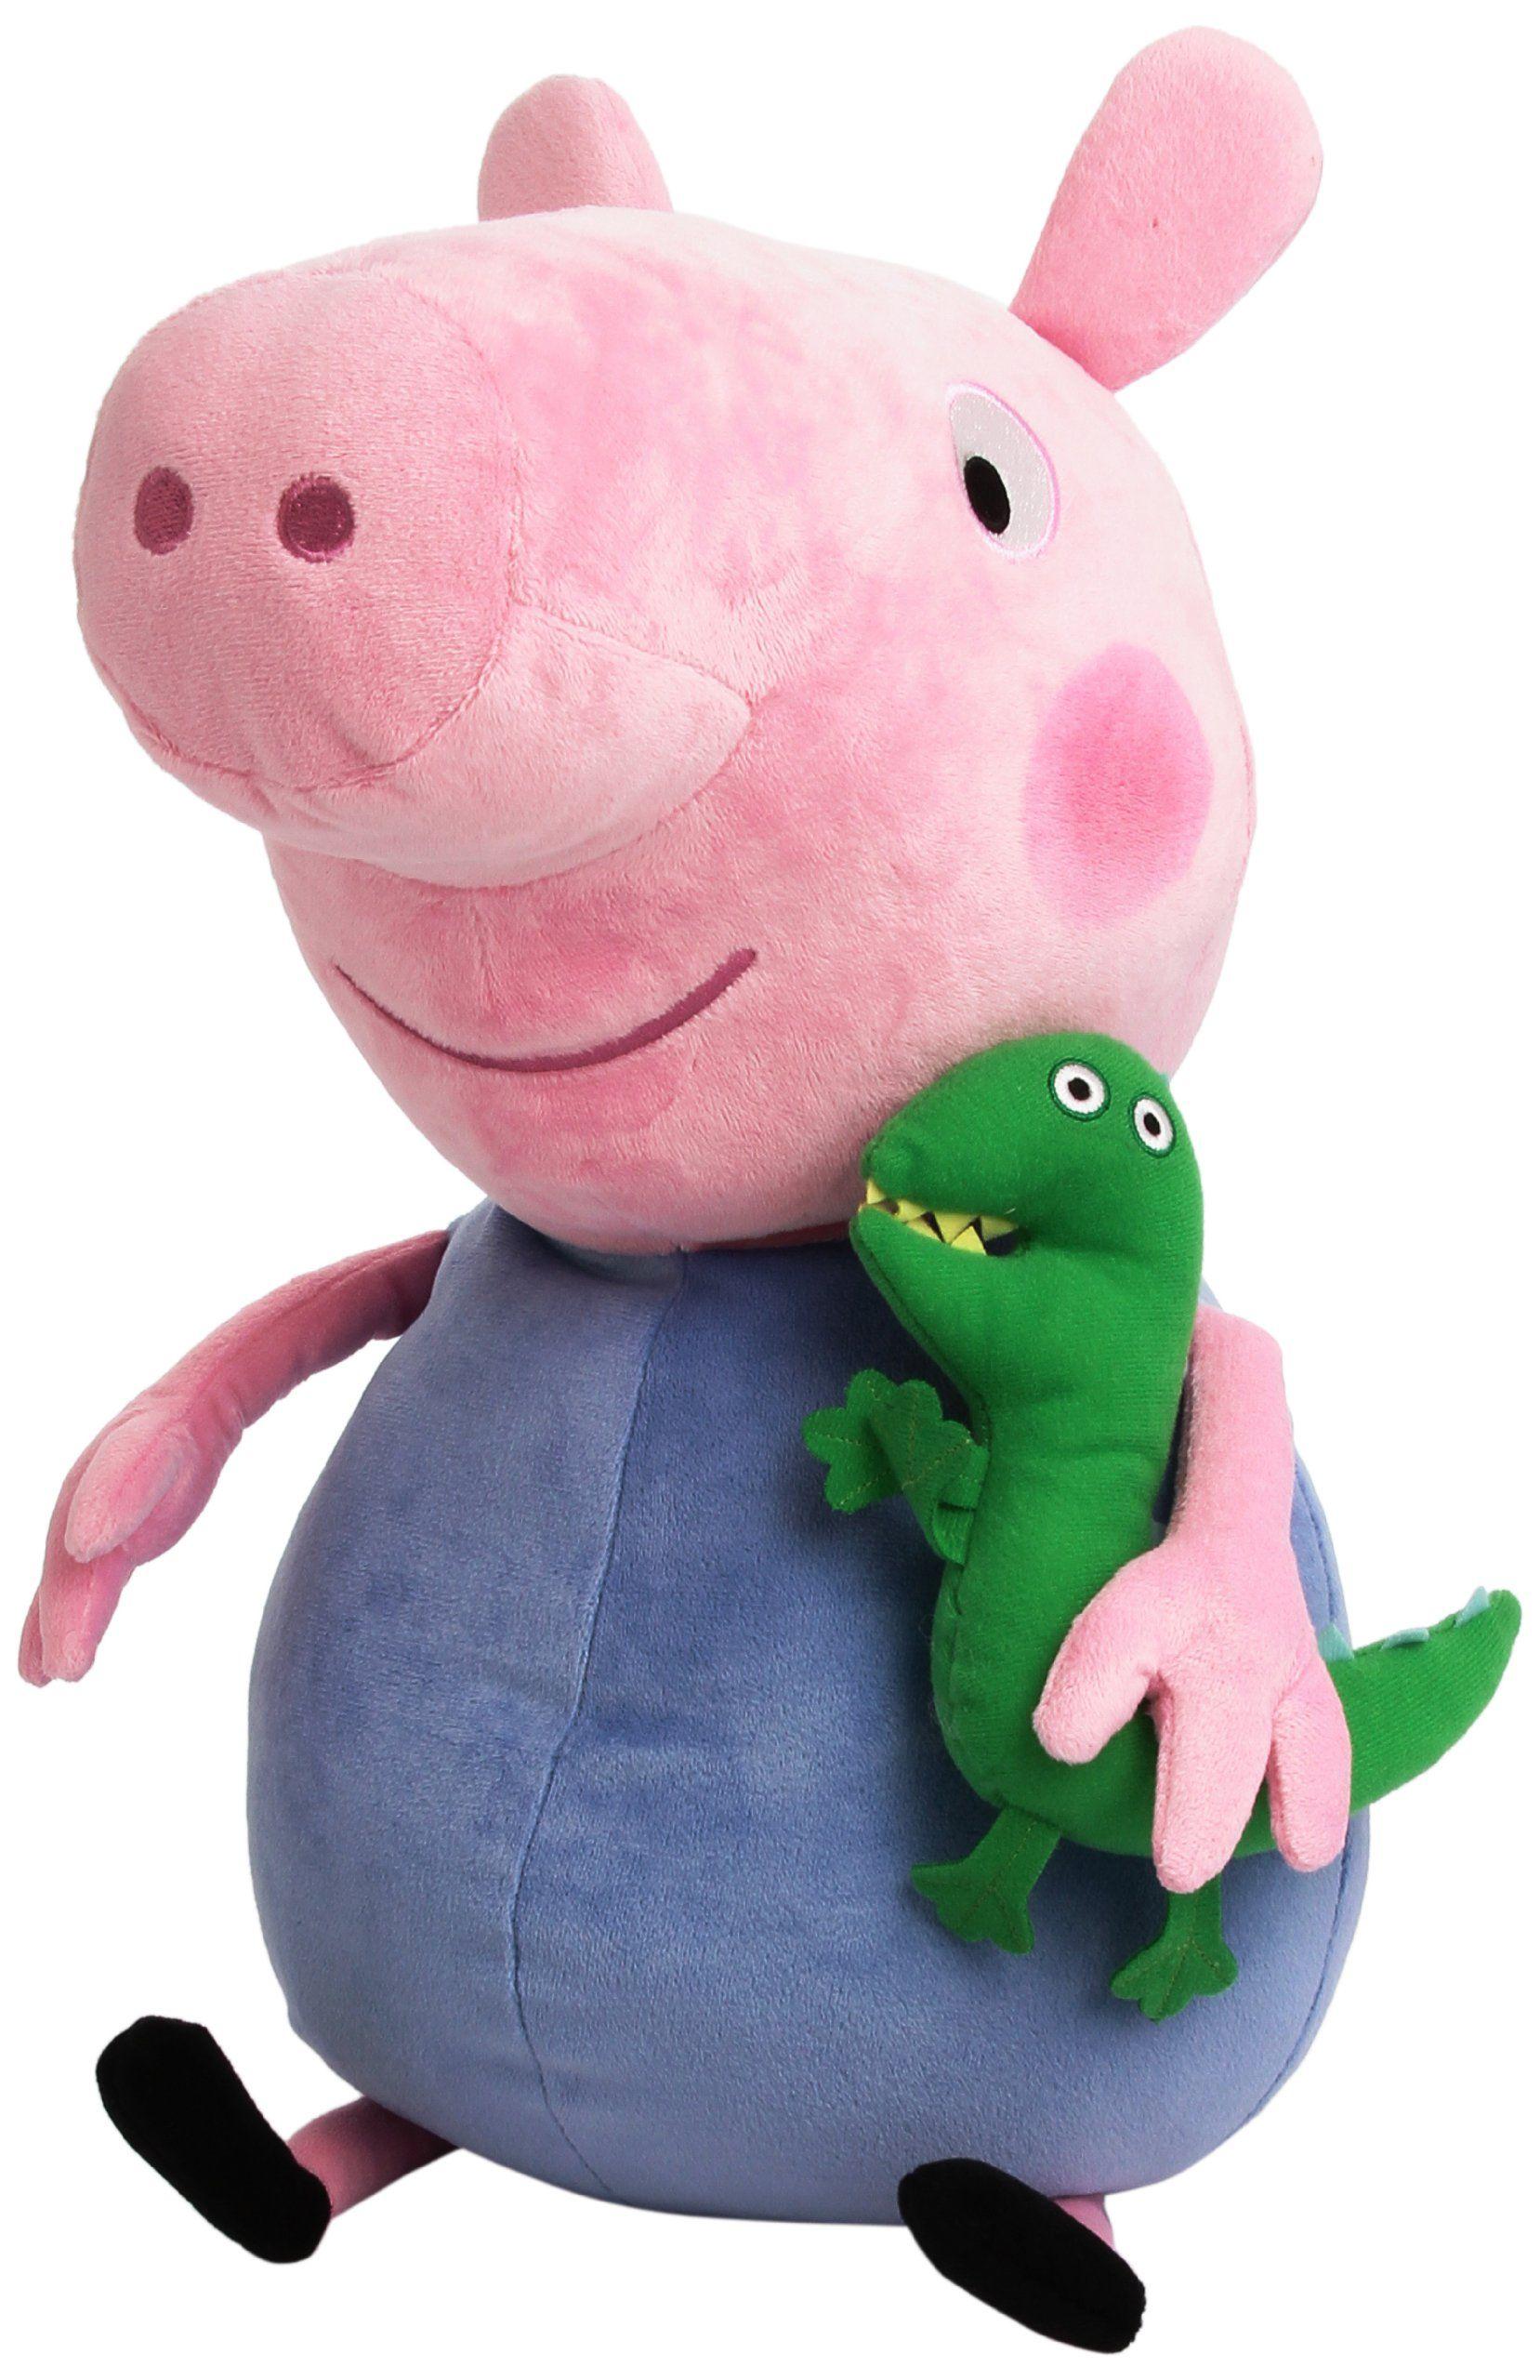 Peppa Pig Ty 15 Plush George Pig Amazon Co Uk Toys Games Cuddle Soft Plush Toy Peppa Pig [ 2560 x 1657 Pixel ]